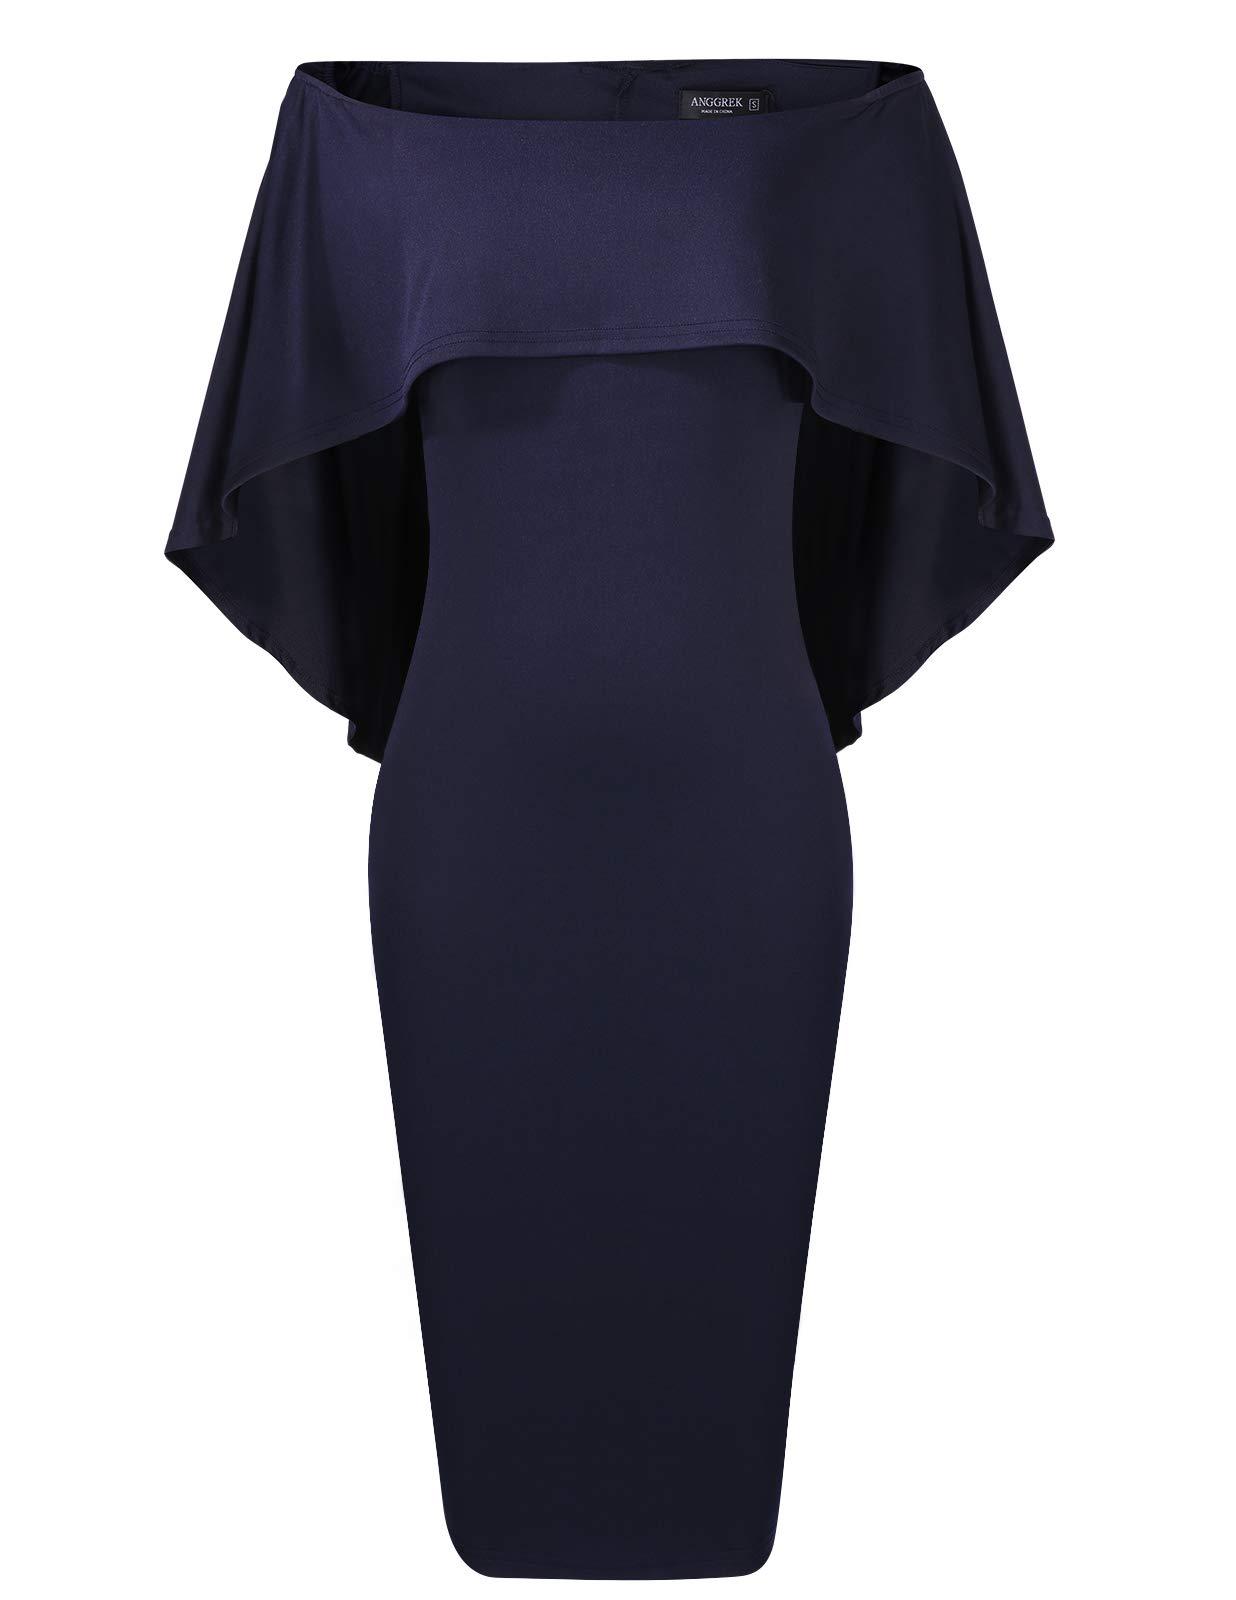 91c9b2feb6 Womens Off The Shoulder Dress Formal Summer Bodycon Cape Dress Midi Navy  Blue M